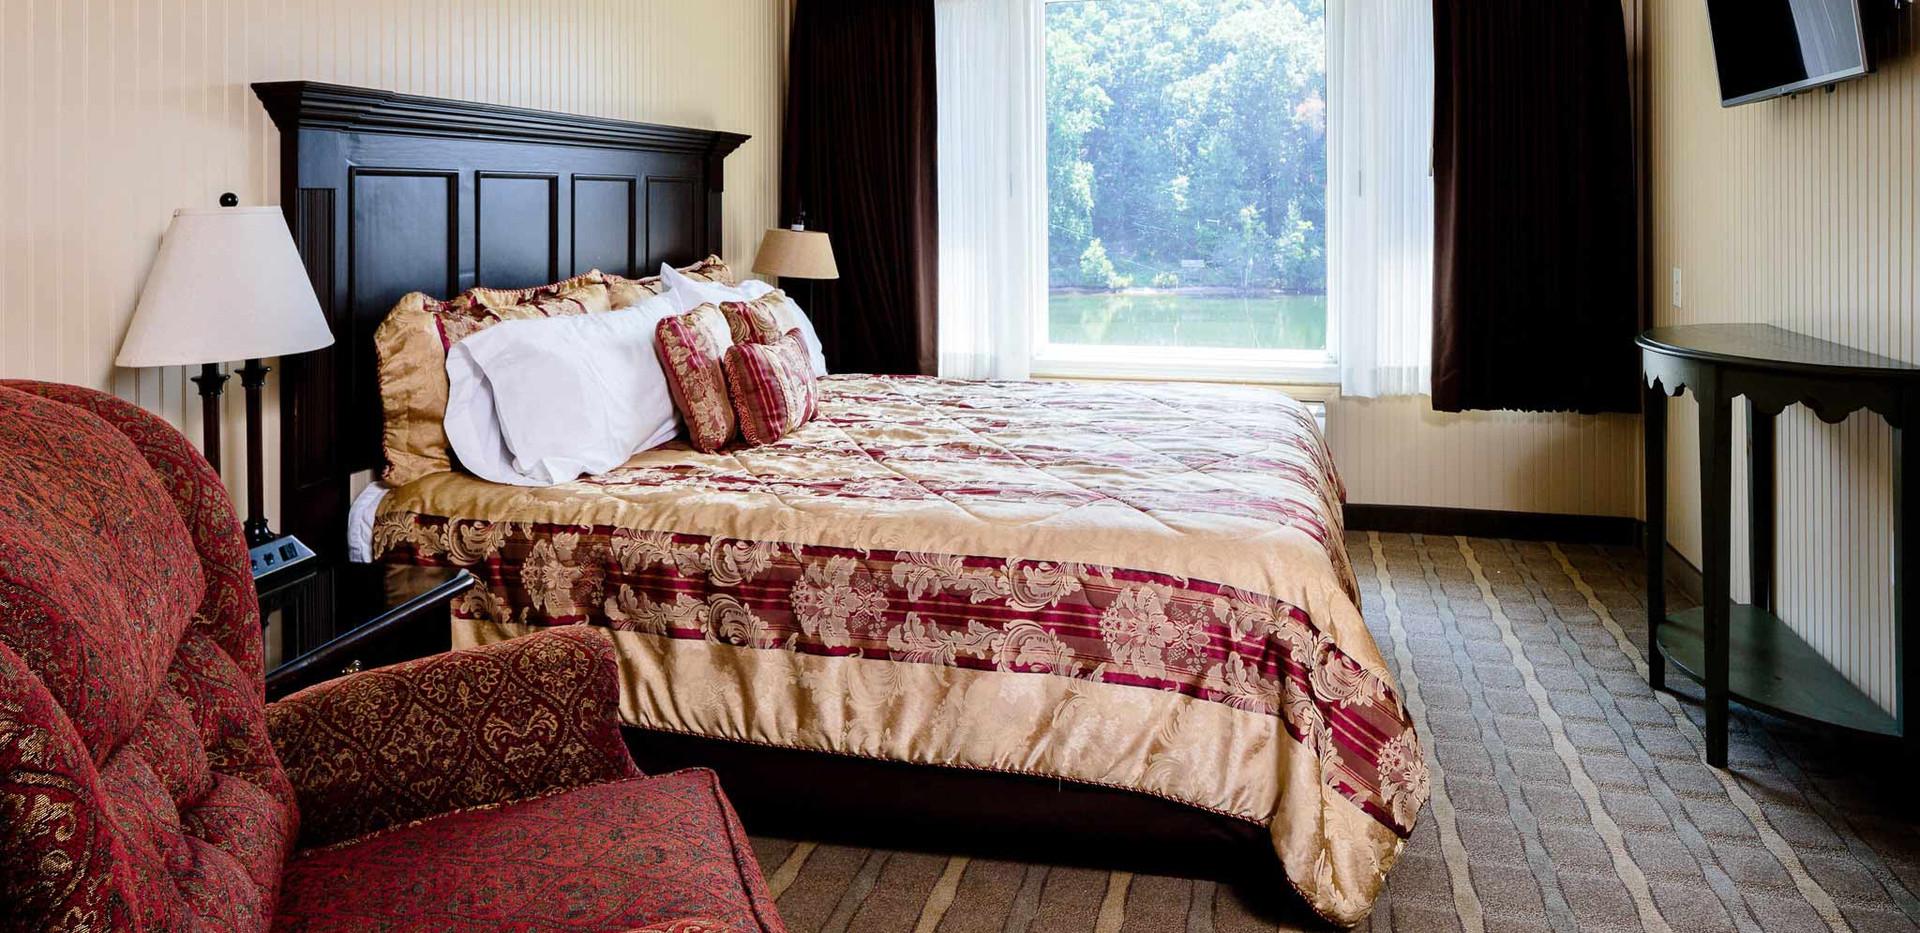 Motel-Room-single king -Enchanted DIY RE-TREAT 2020